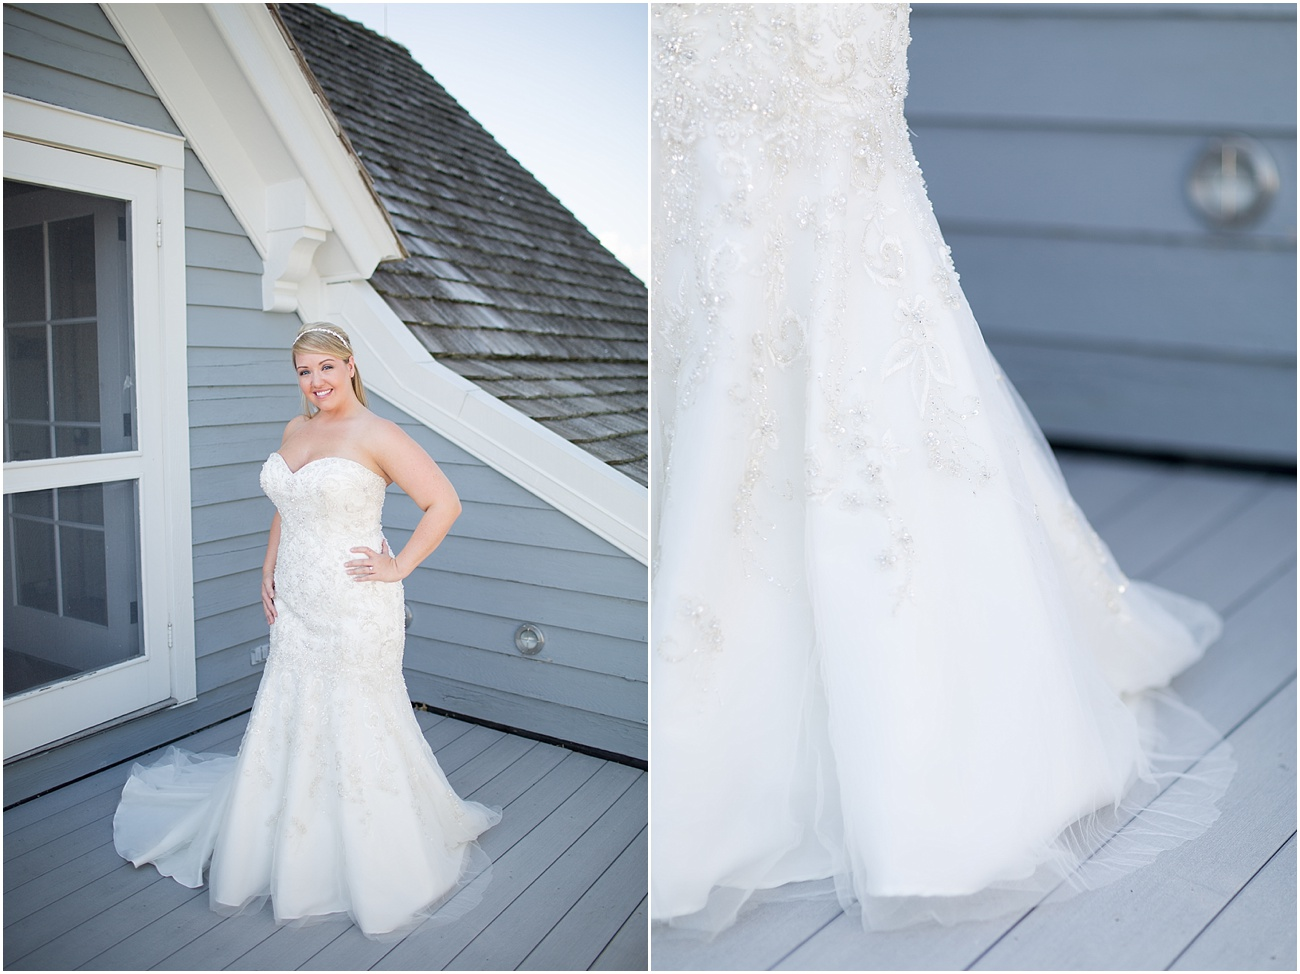 Lacey_Bridal_Portraits_Elk_Manor_Winery_Maryland_Wedding_Photographer_0025